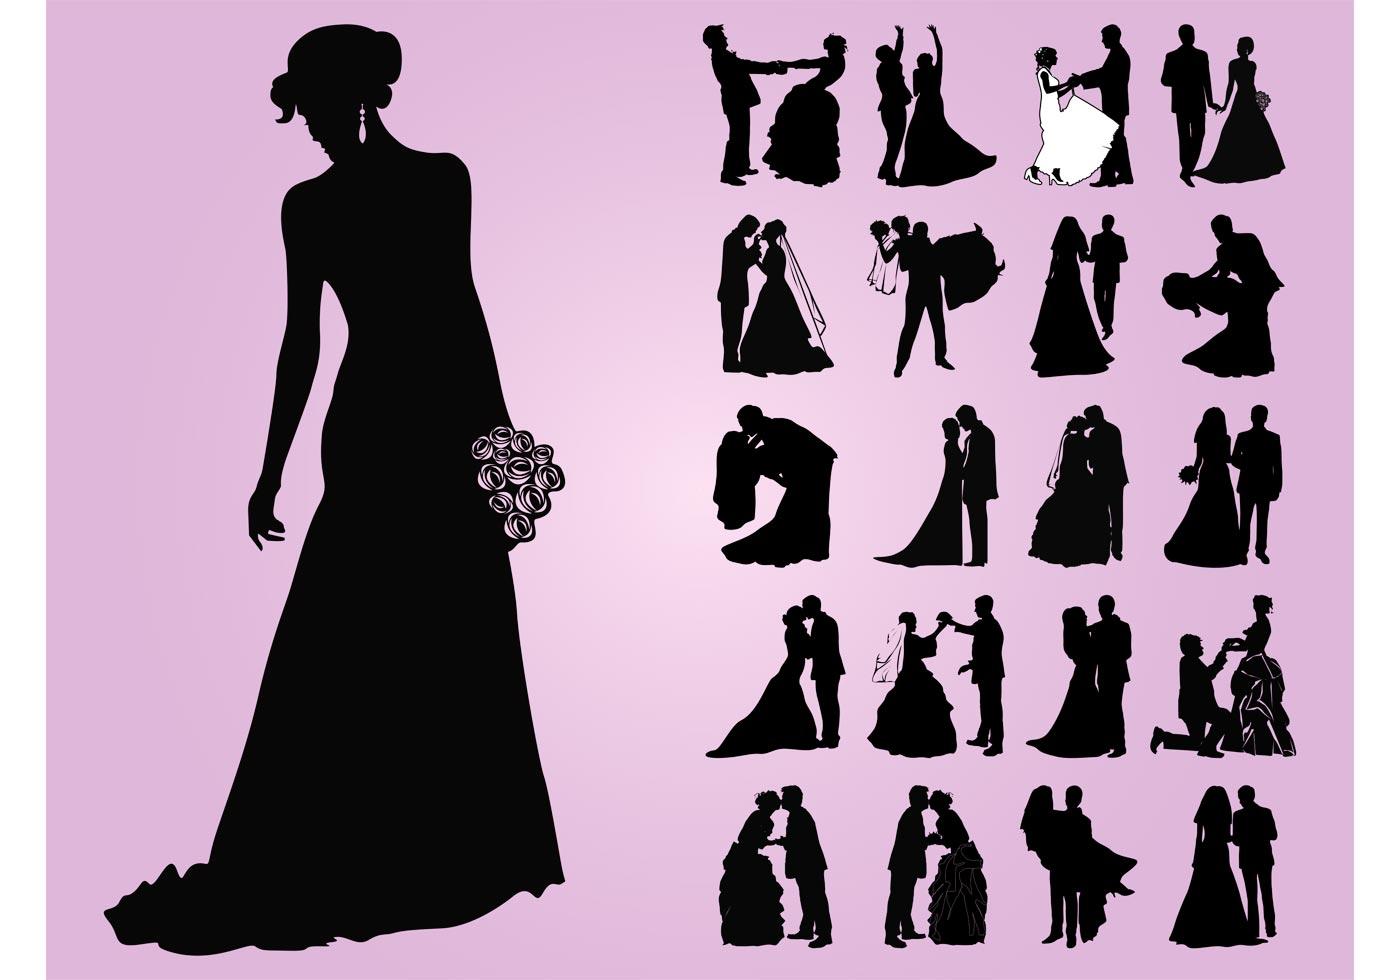 Wedding Designs - Download Free Vector Art, Stock Graphics & Images